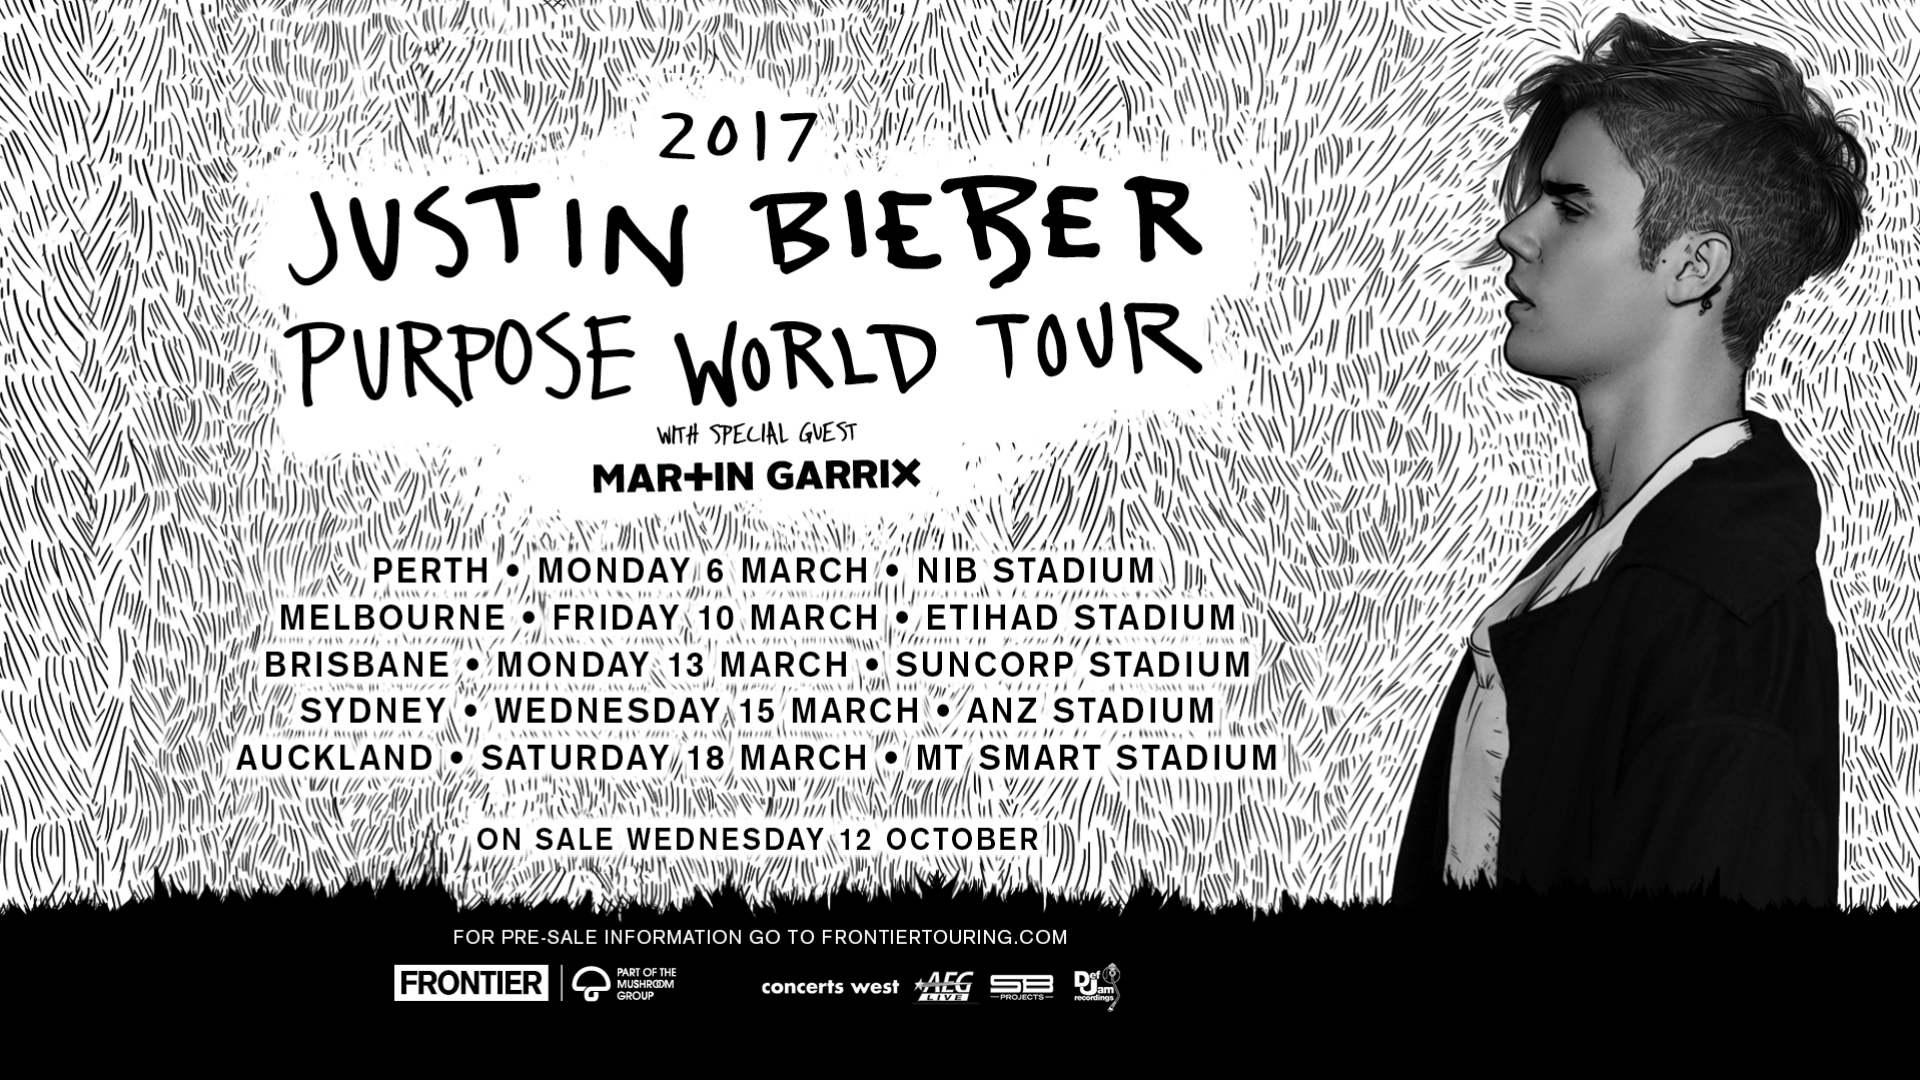 Justin bieber tour dates 2019 in Melbourne